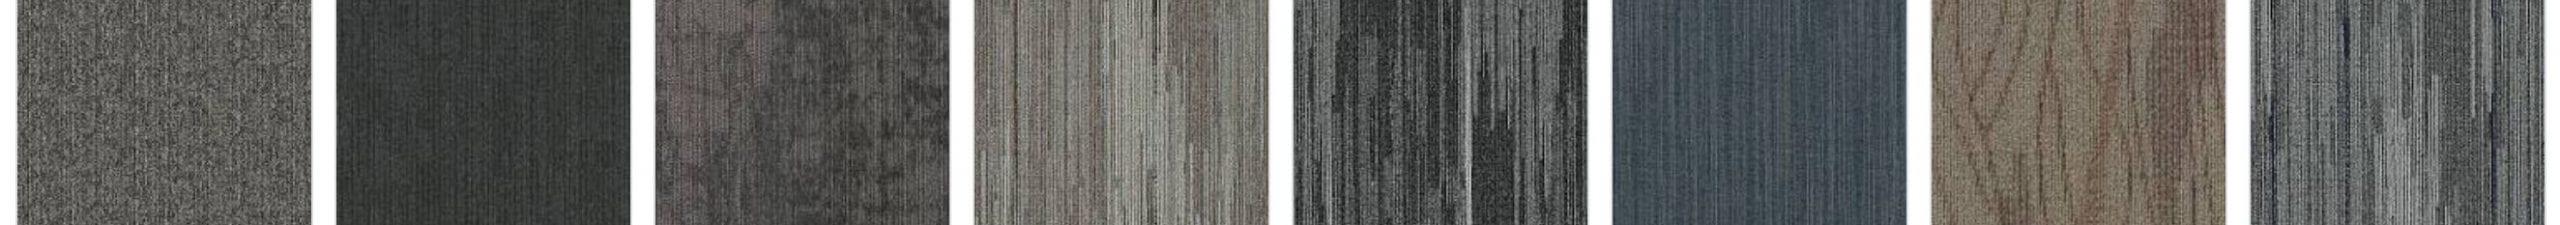 popular carpet patterns for PSAPs